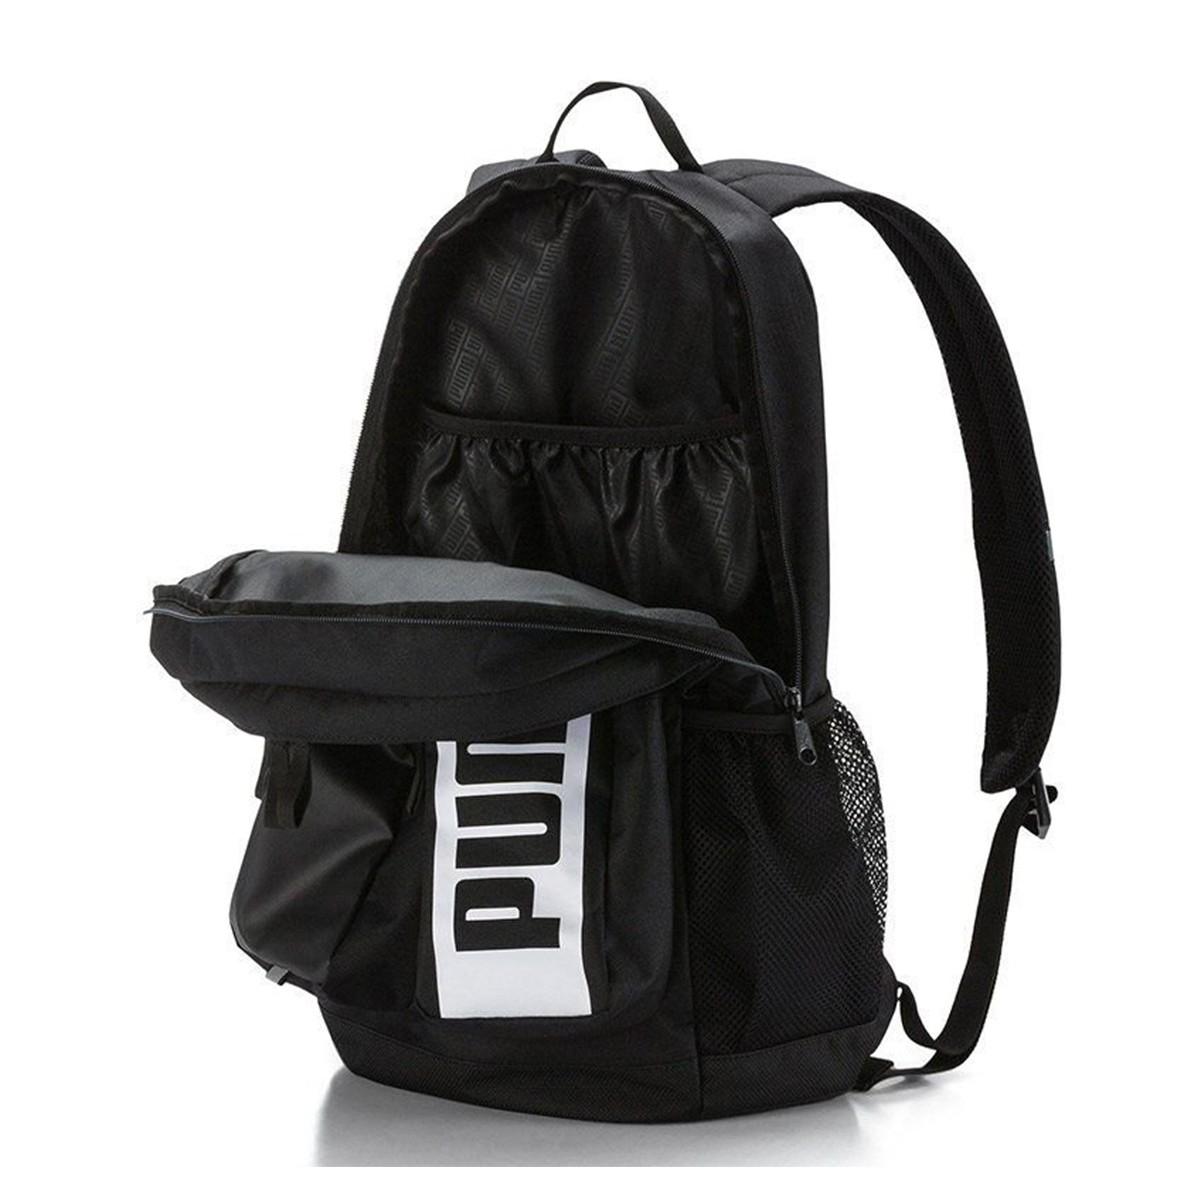 Mochila Puma Deck Backpack II - Preta - Masculina